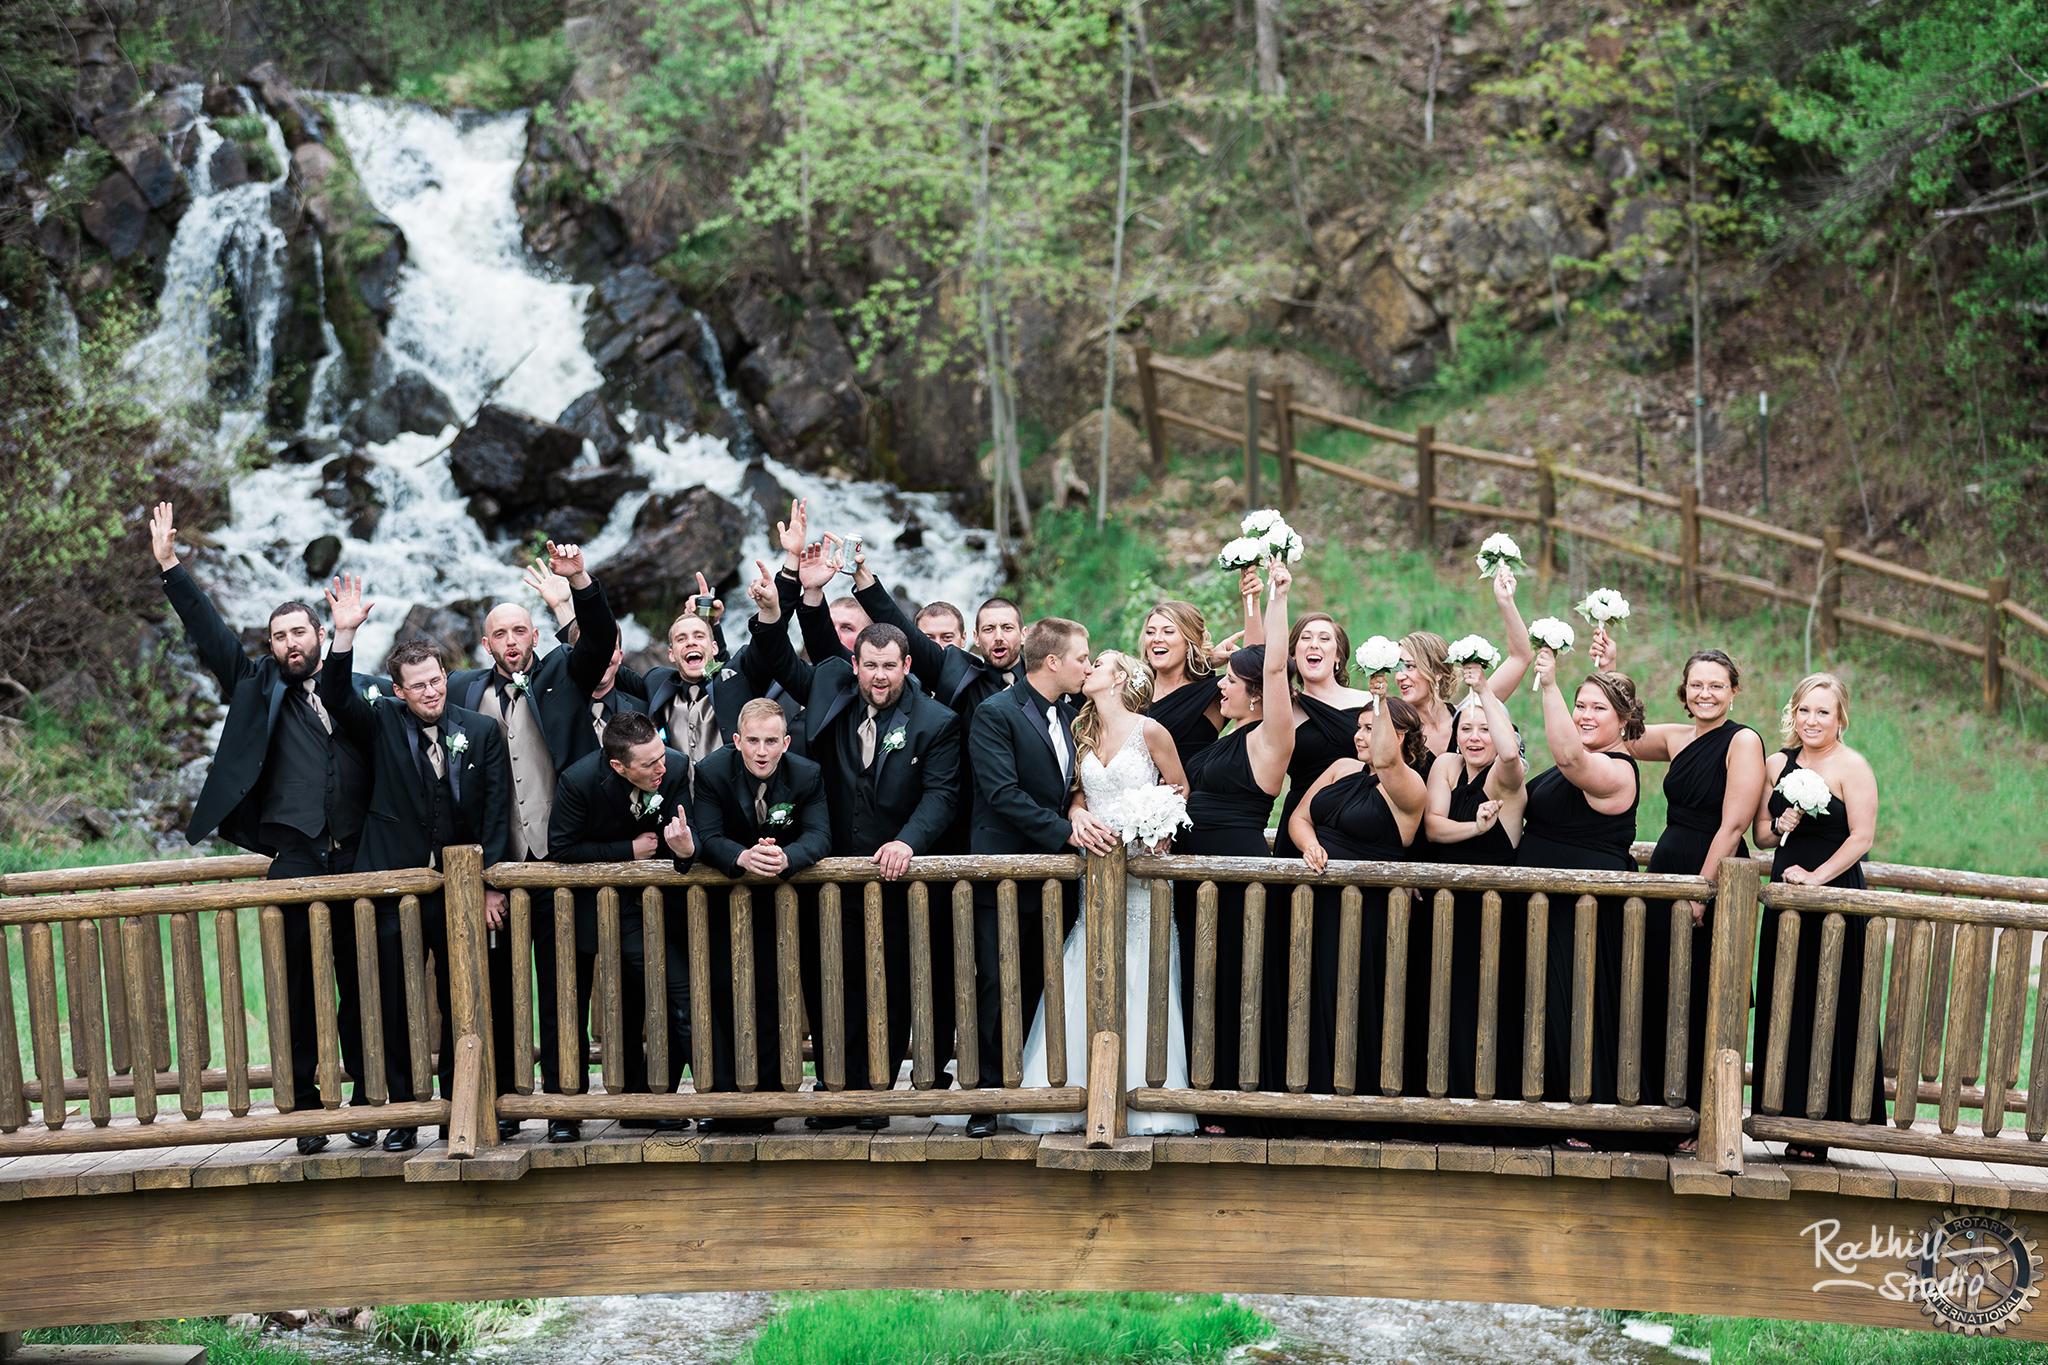 traverse-city-wedding-photographer-rockhill-studio-michigan-cb-1.jpg